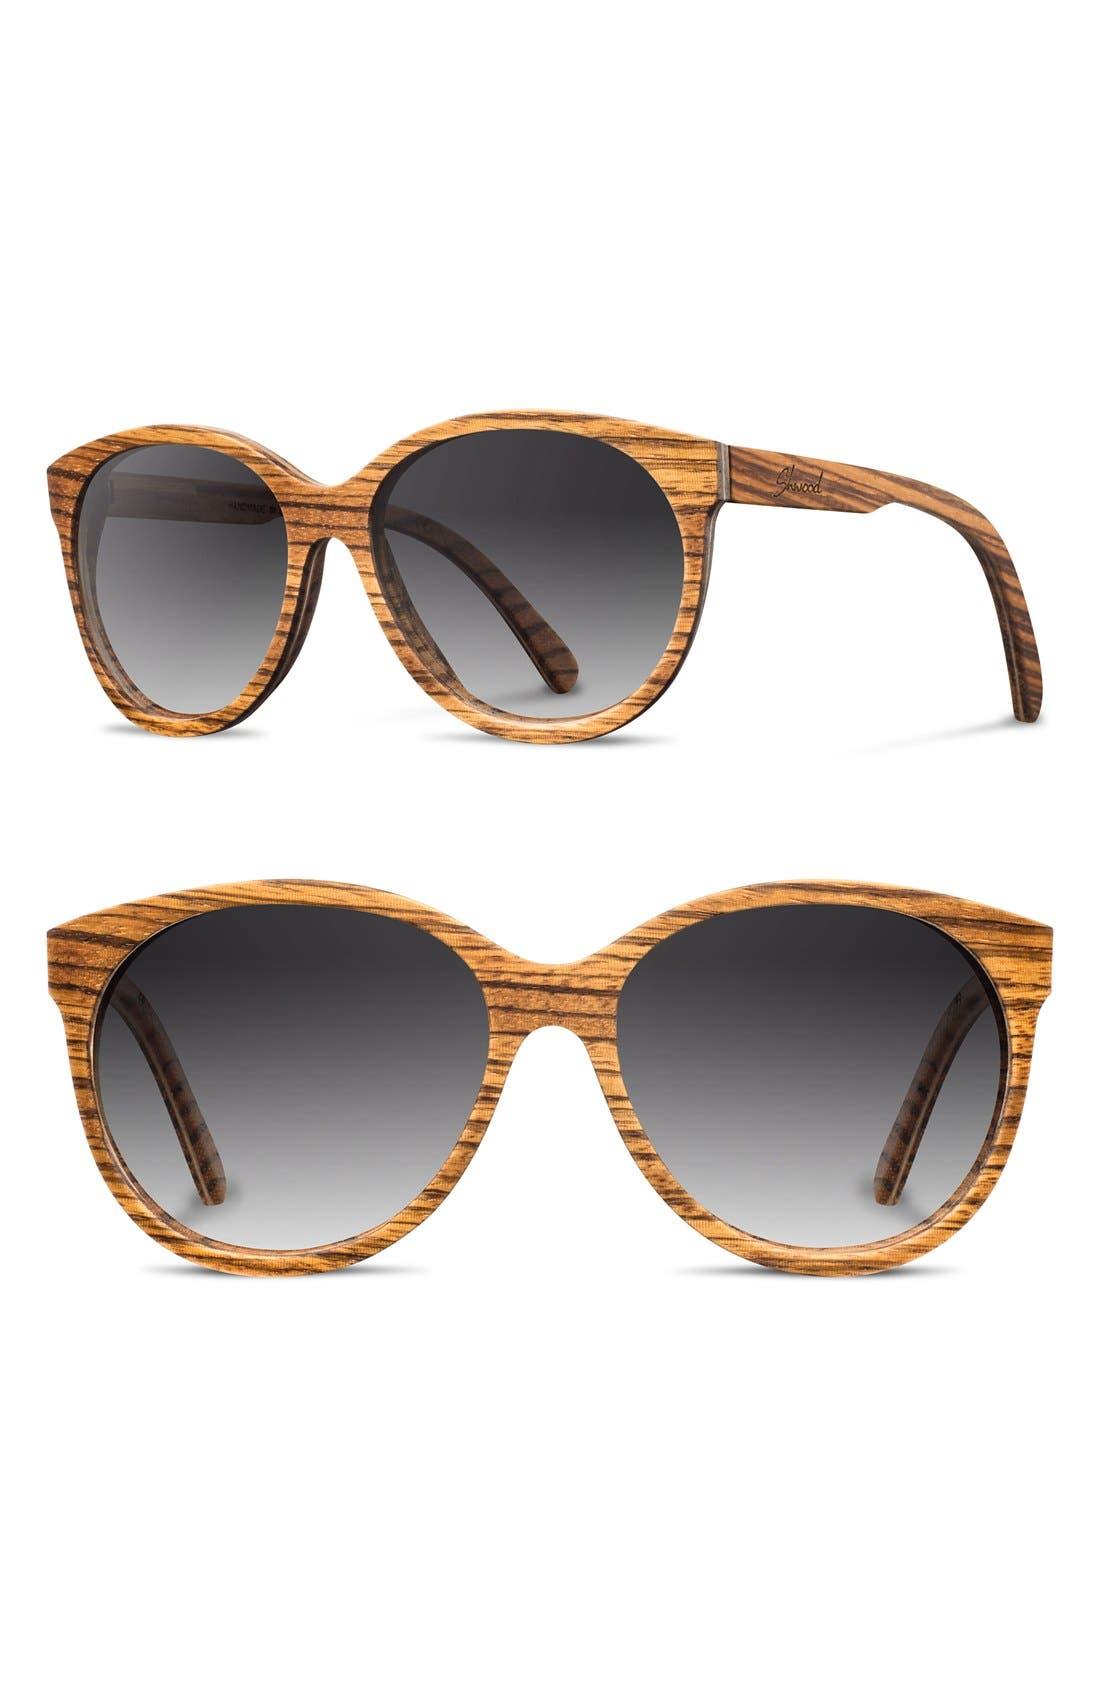 'Madison' 54mm Polarized Round Wood Sunglasses,                             Main thumbnail 1, color,                             219